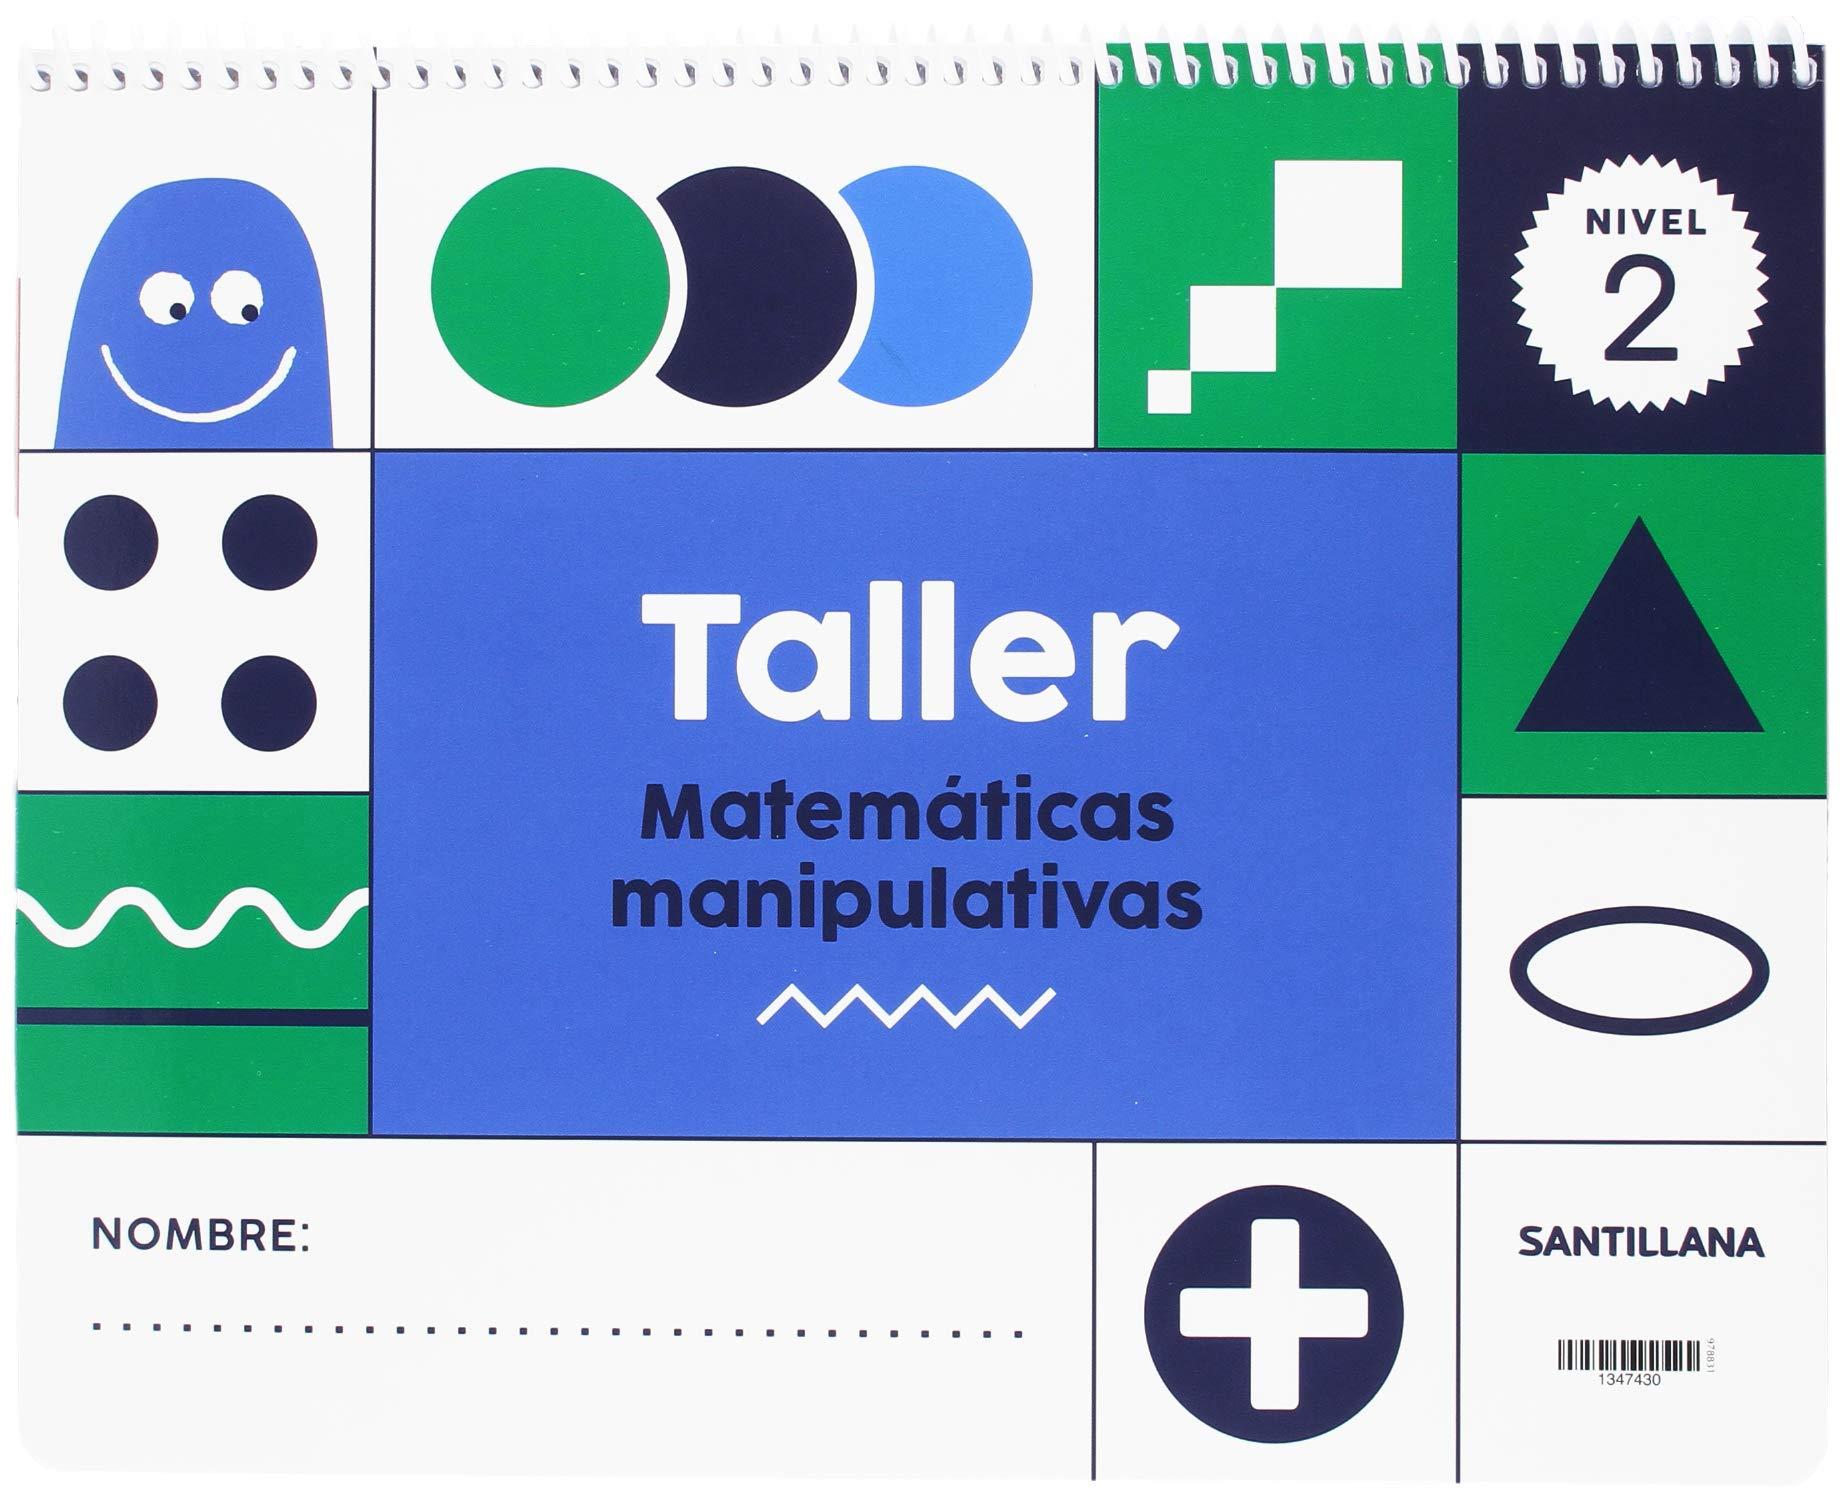 Taller Matematicas Manipulativas Nivel 2 Amazon Es Vv Aa Vv Aa Libros